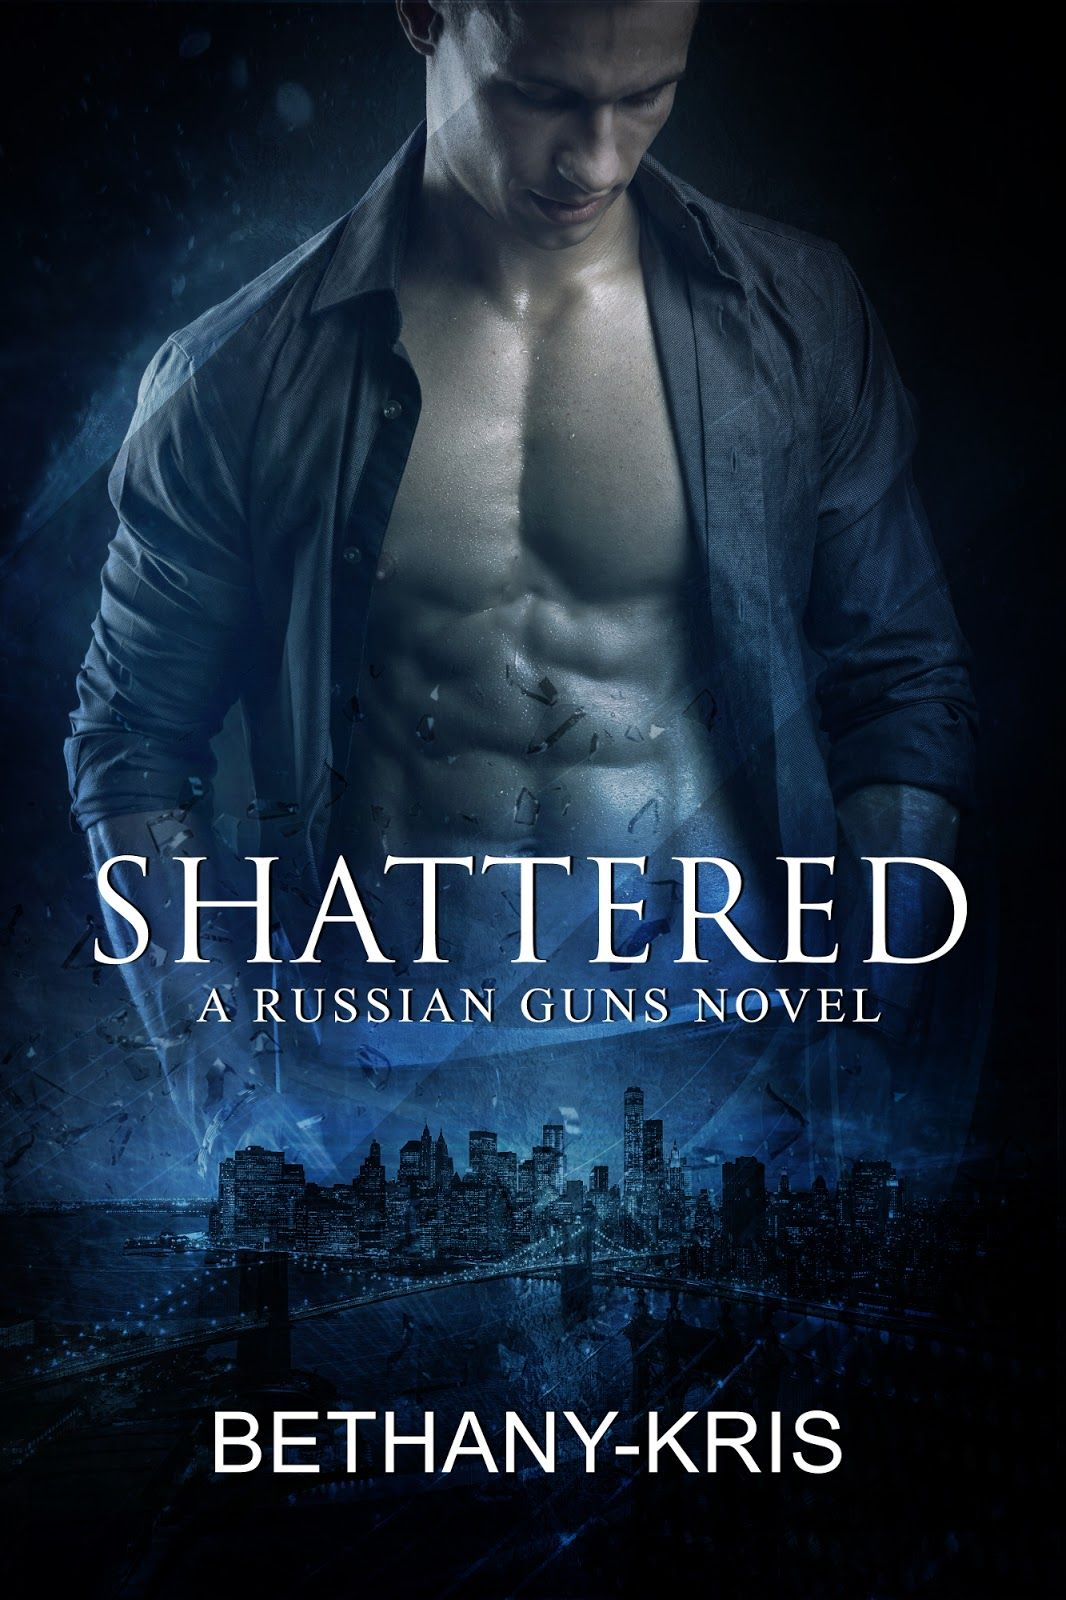 BethanyKris writes Cover Reveal Shattered, The